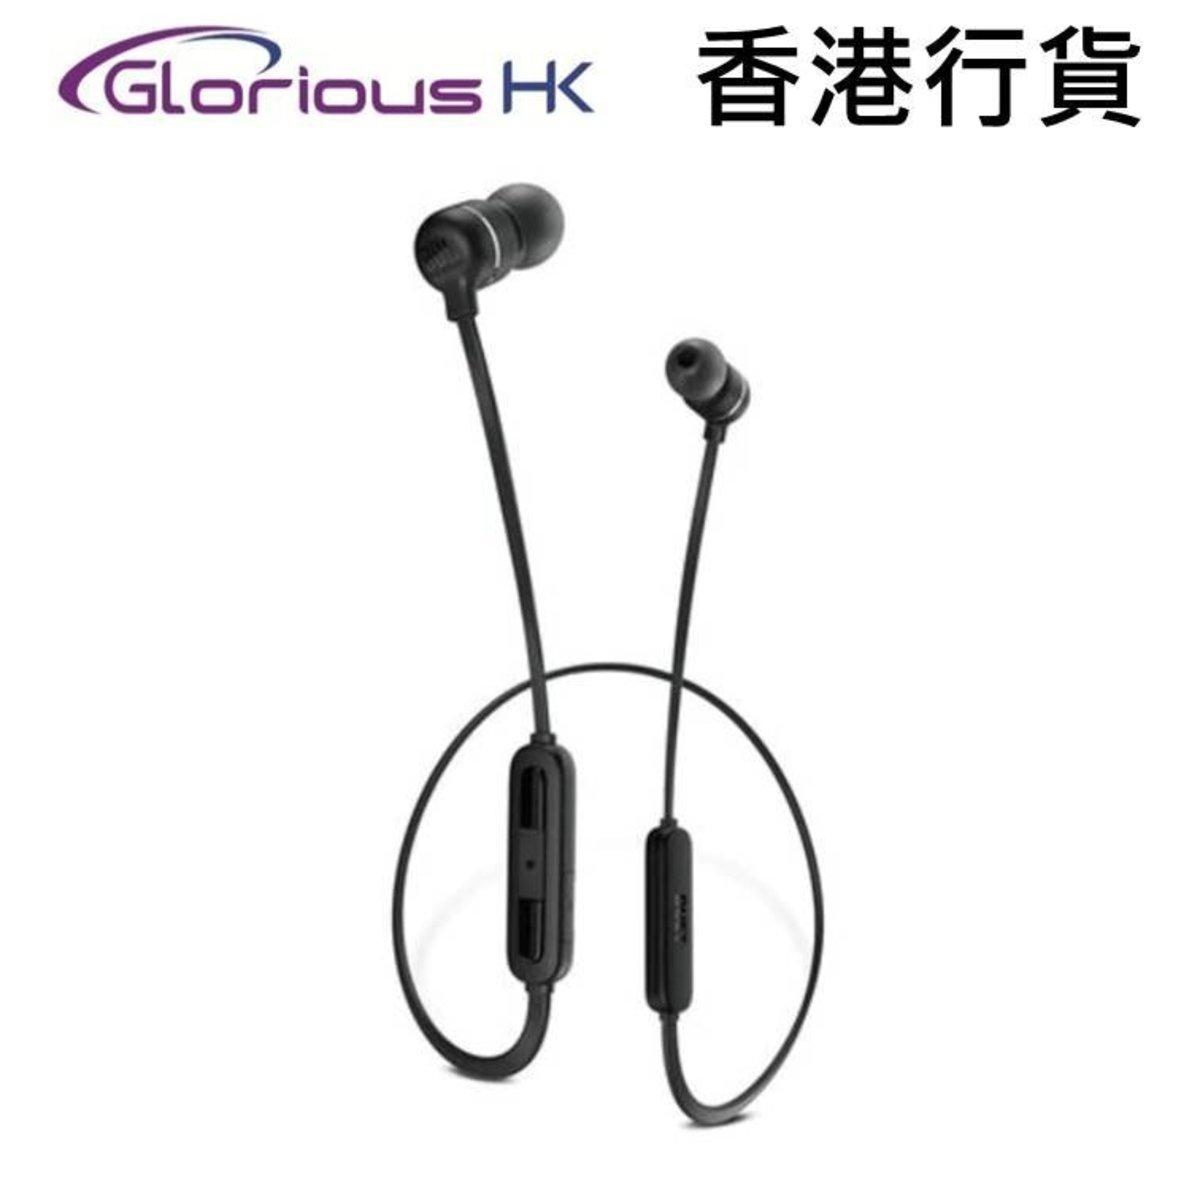 DUET Mini 2 無線入耳式耳機 黑色 香港行貨